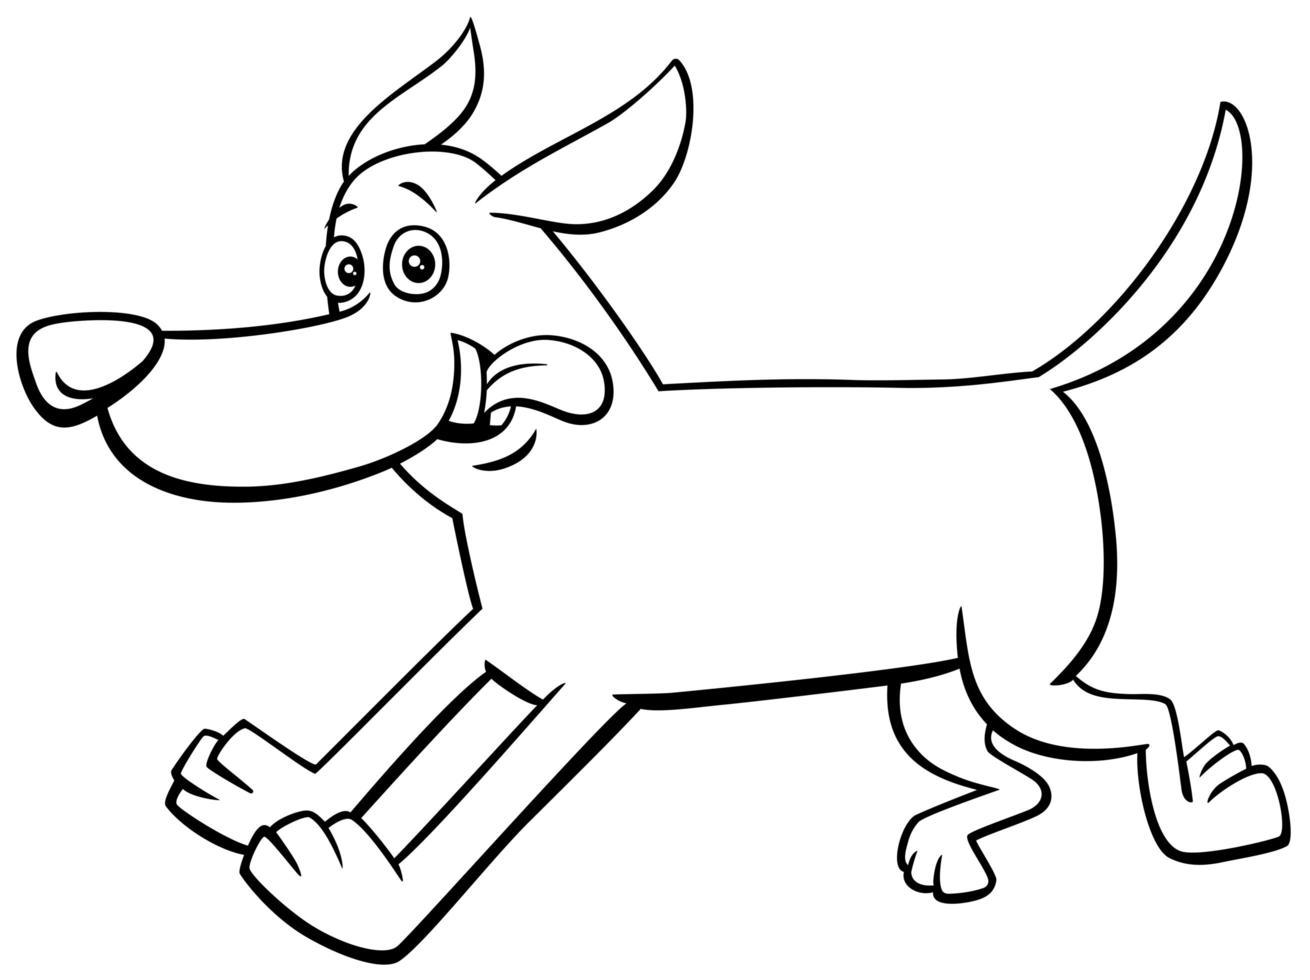 Happy Running Dog Charakter Malbuch Seite vektor